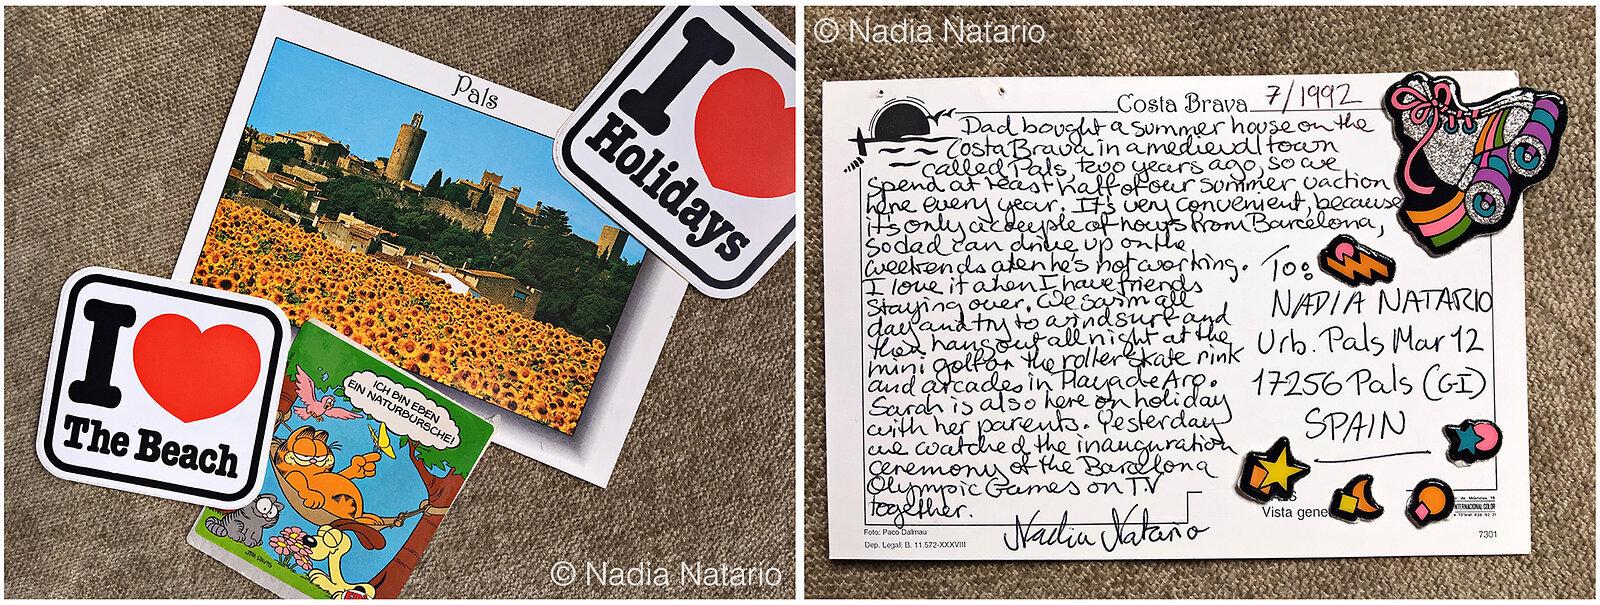 Postcards to Myself - Pals, Spain, 1992